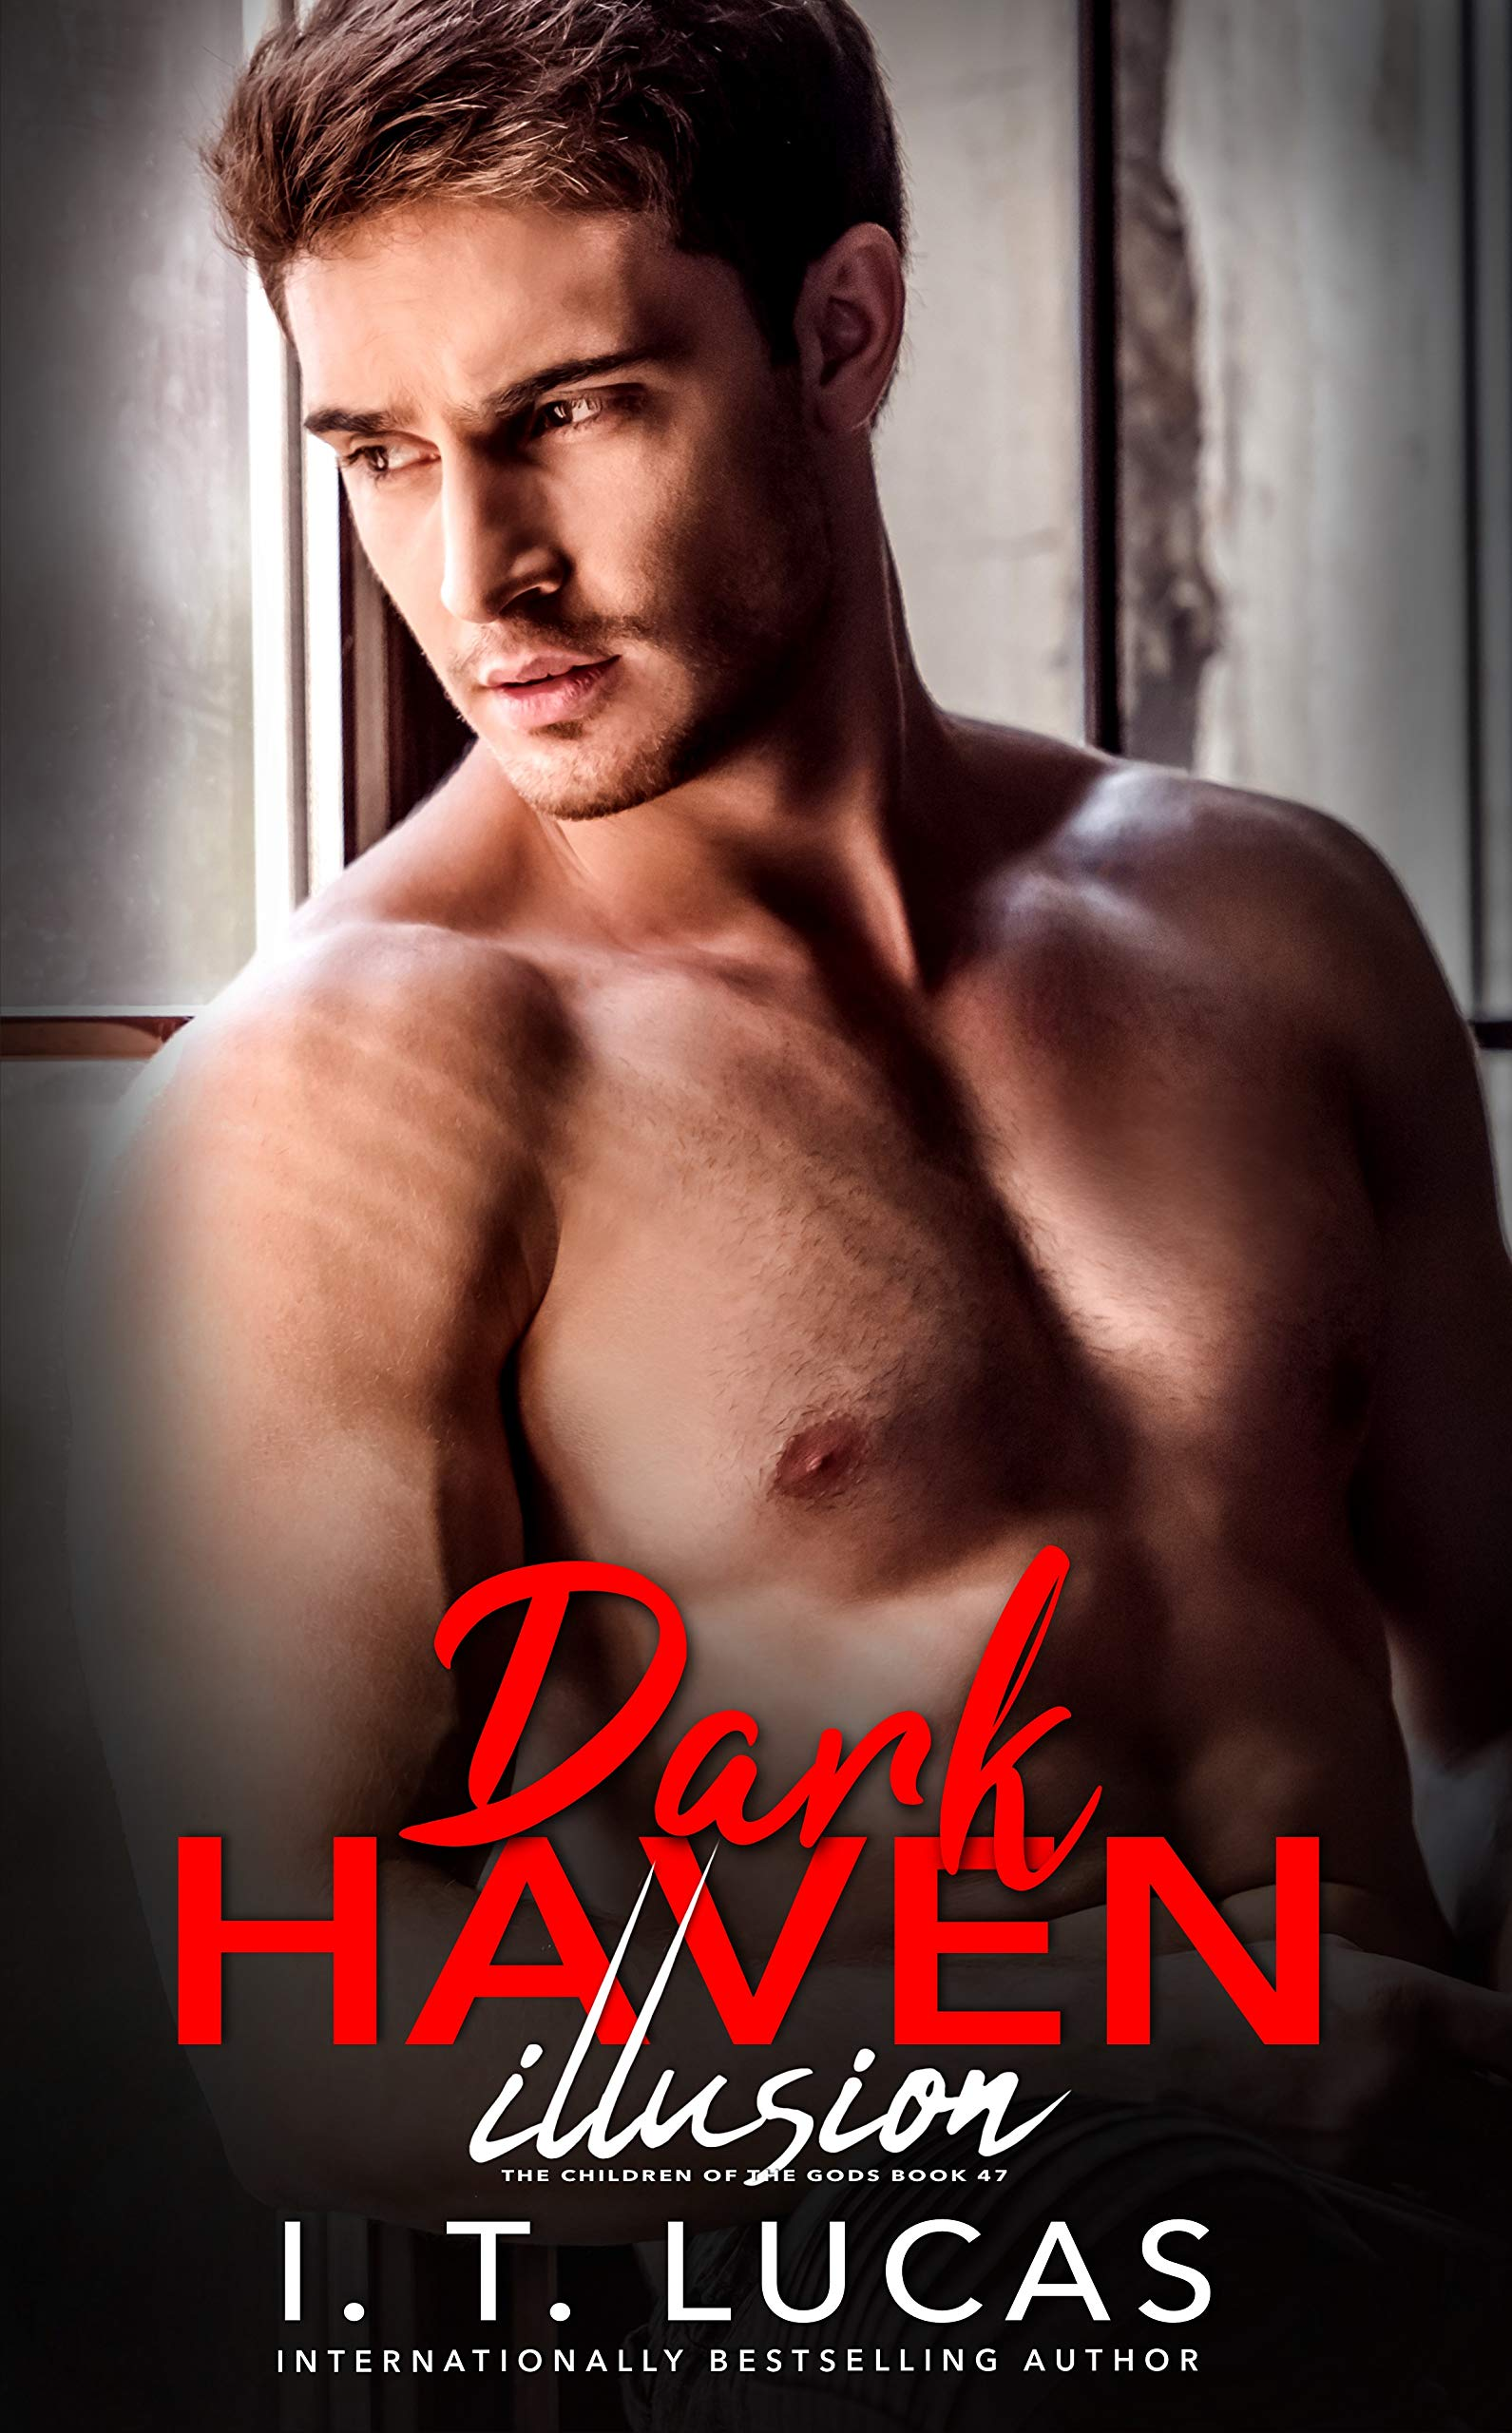 Dark Haven Illusion (The Children Of The Gods #47)